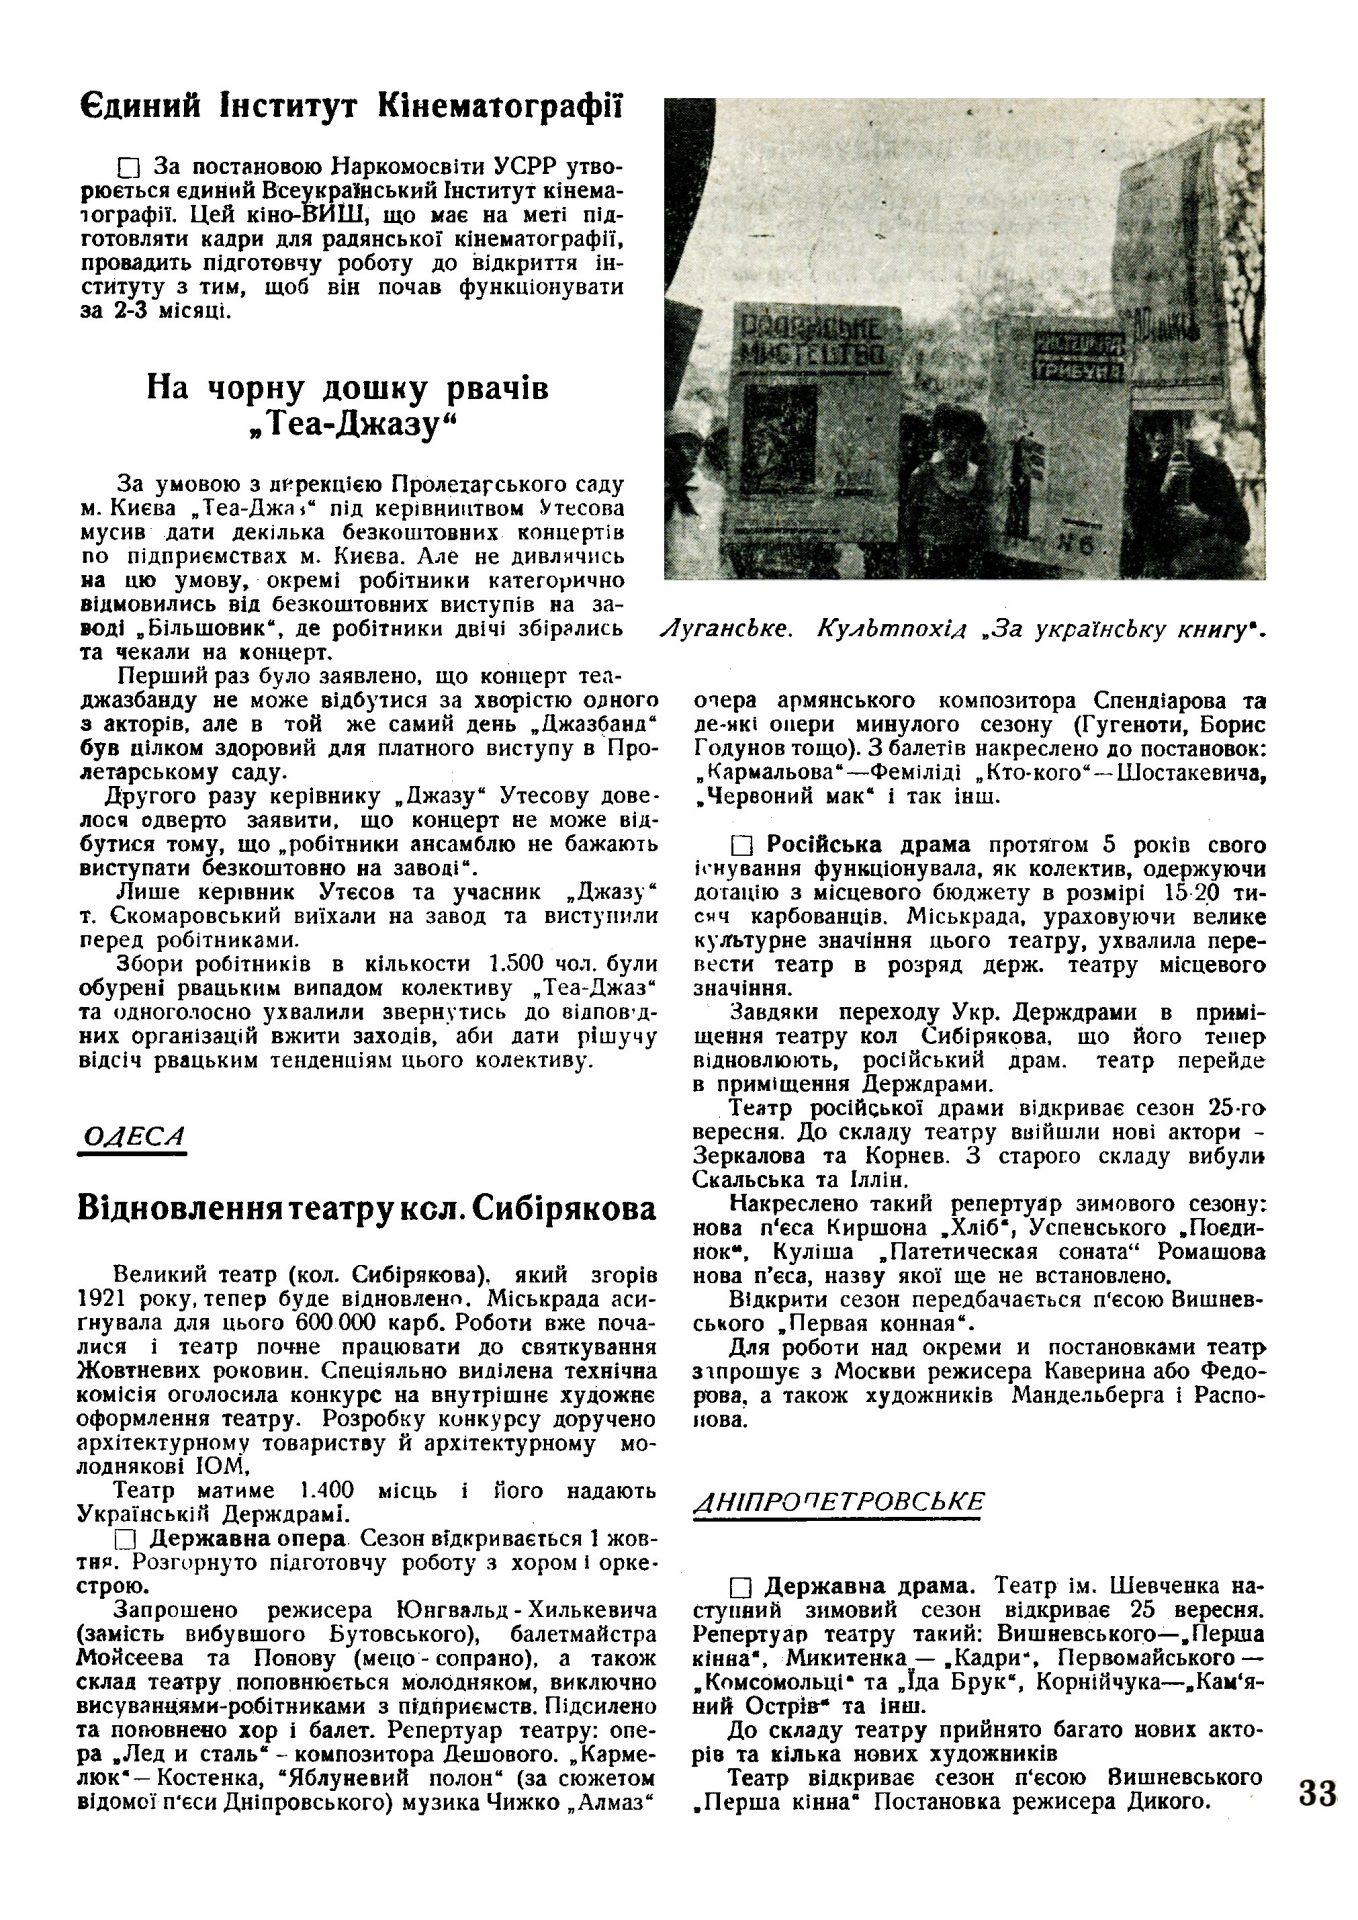 Мистецька трибуна_1930_№ 12-13